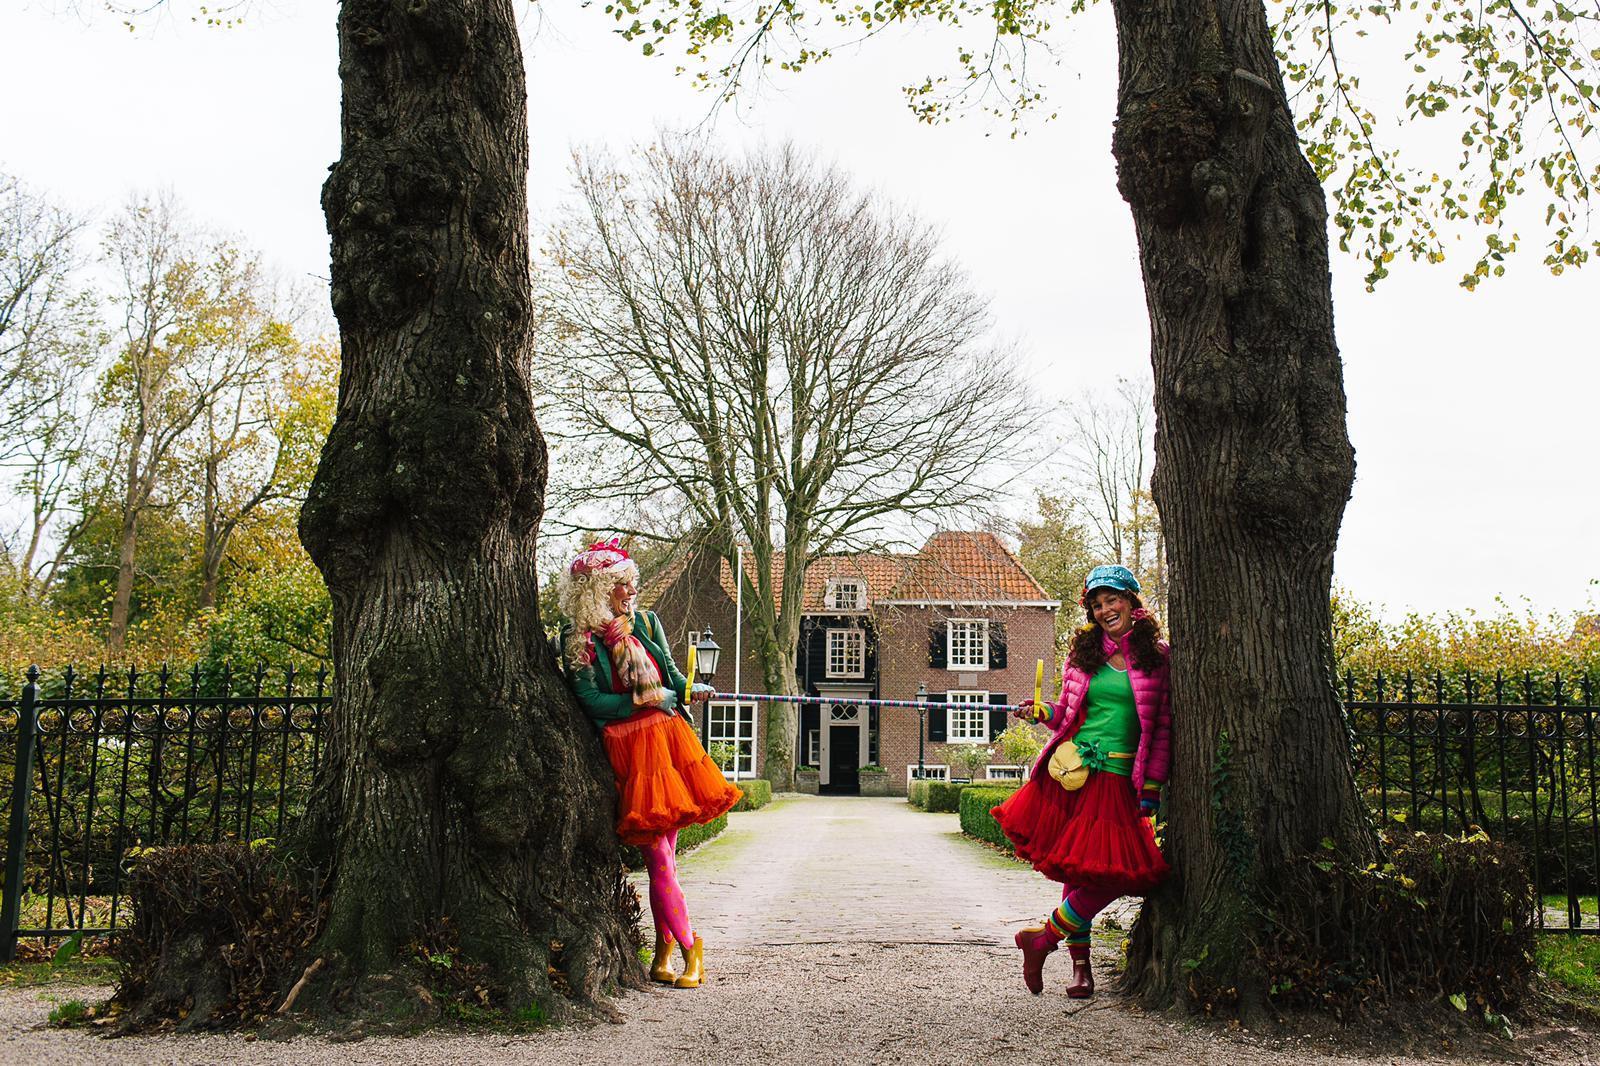 Sint in Voorhout dit jaar op film en met livestream